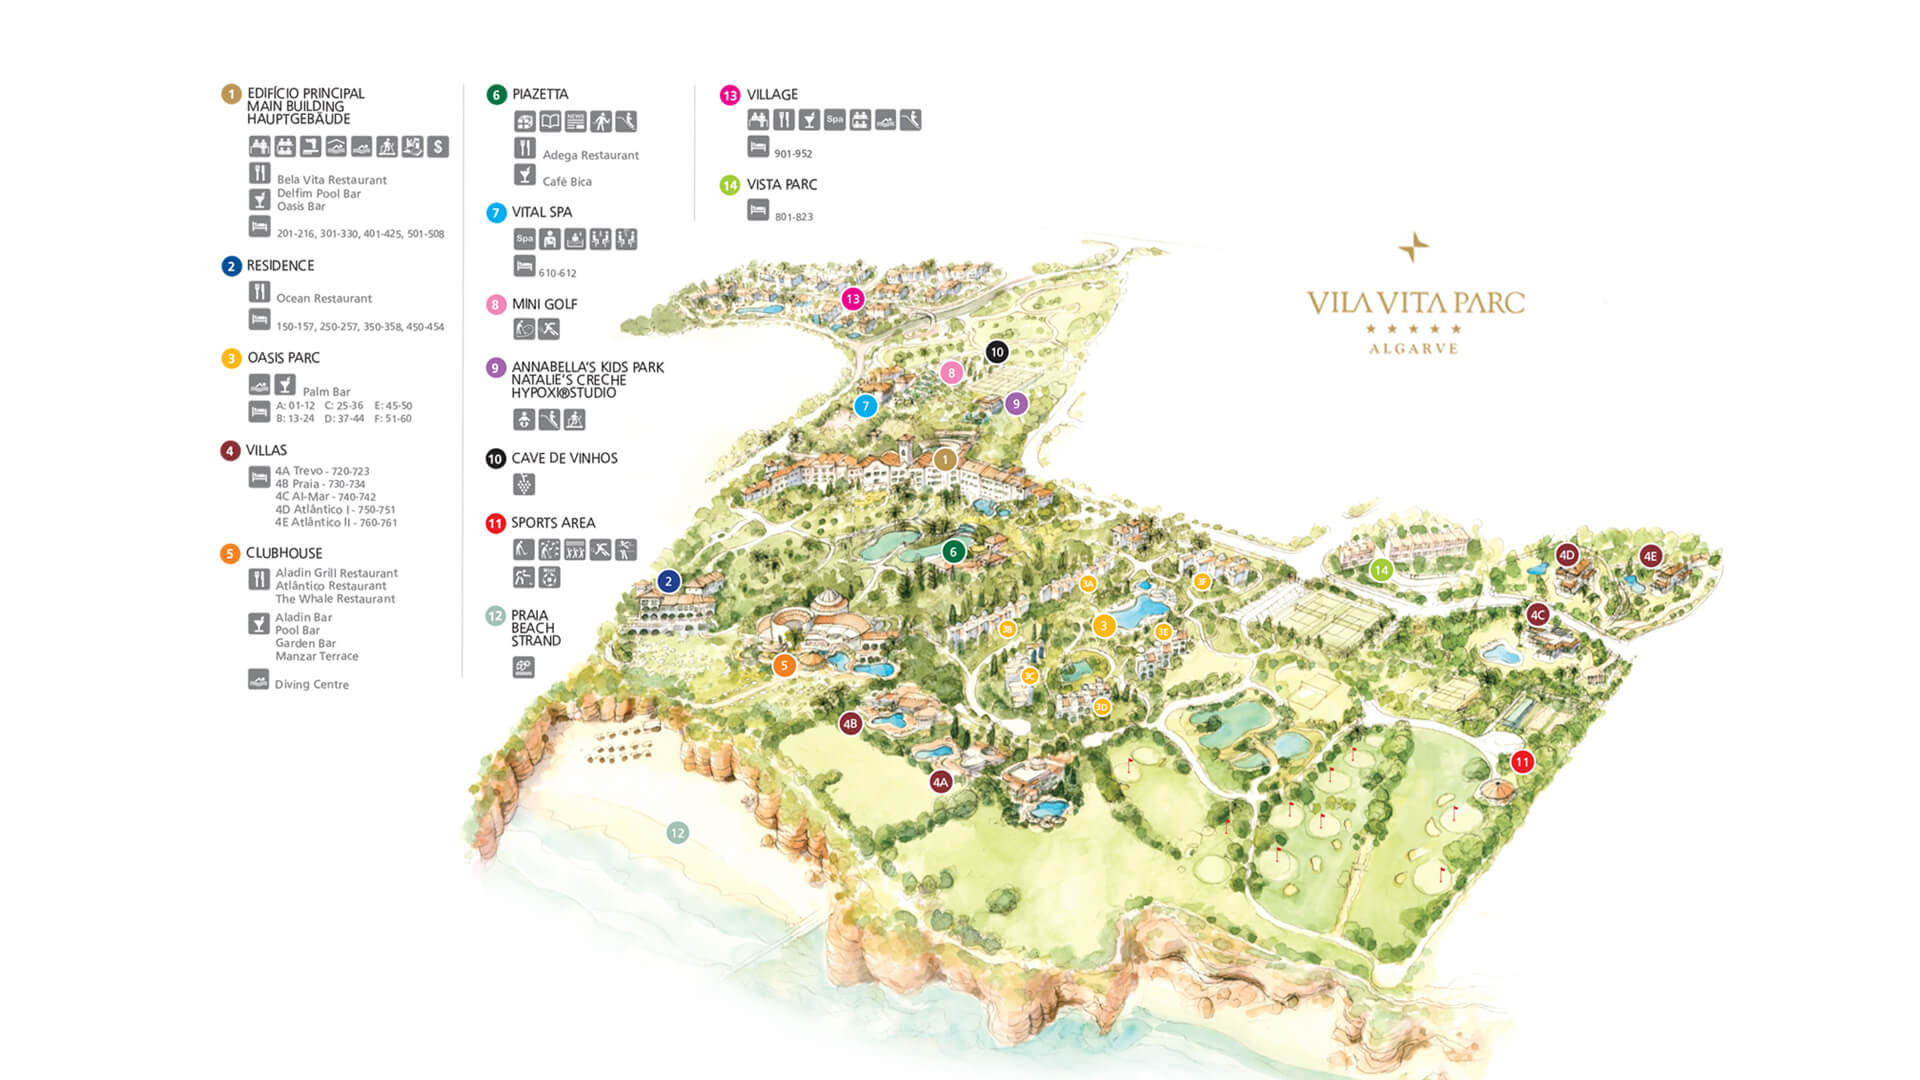 services-comercial-maps-gallery-hd-1920x1080_vila-vita-parc